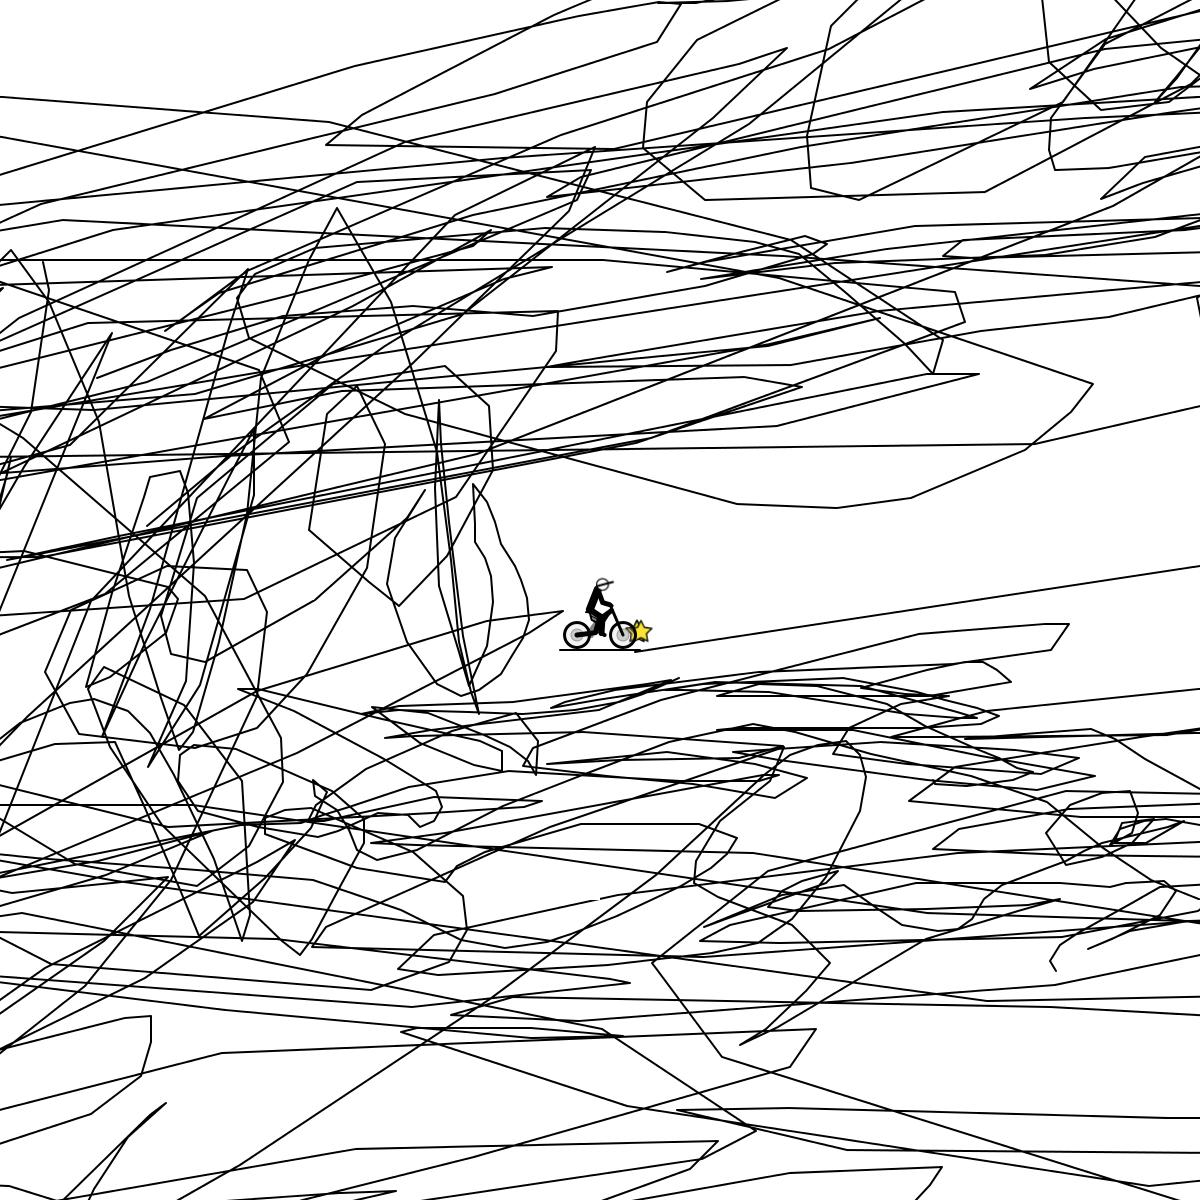 ride the glitch by mega5